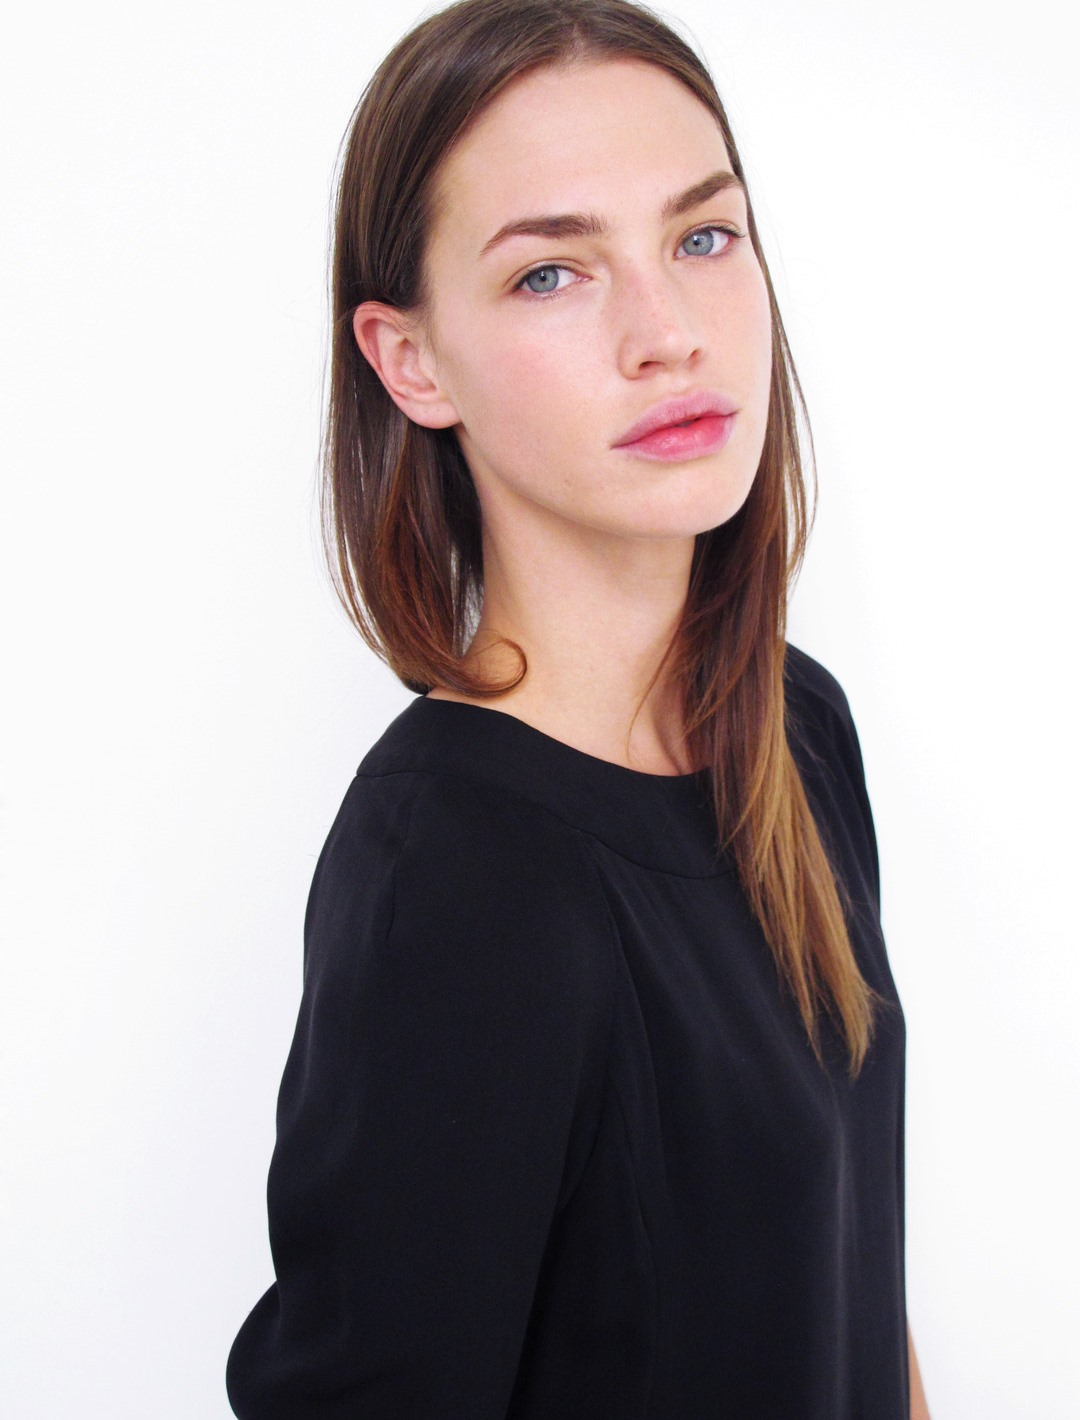 Crista Cober